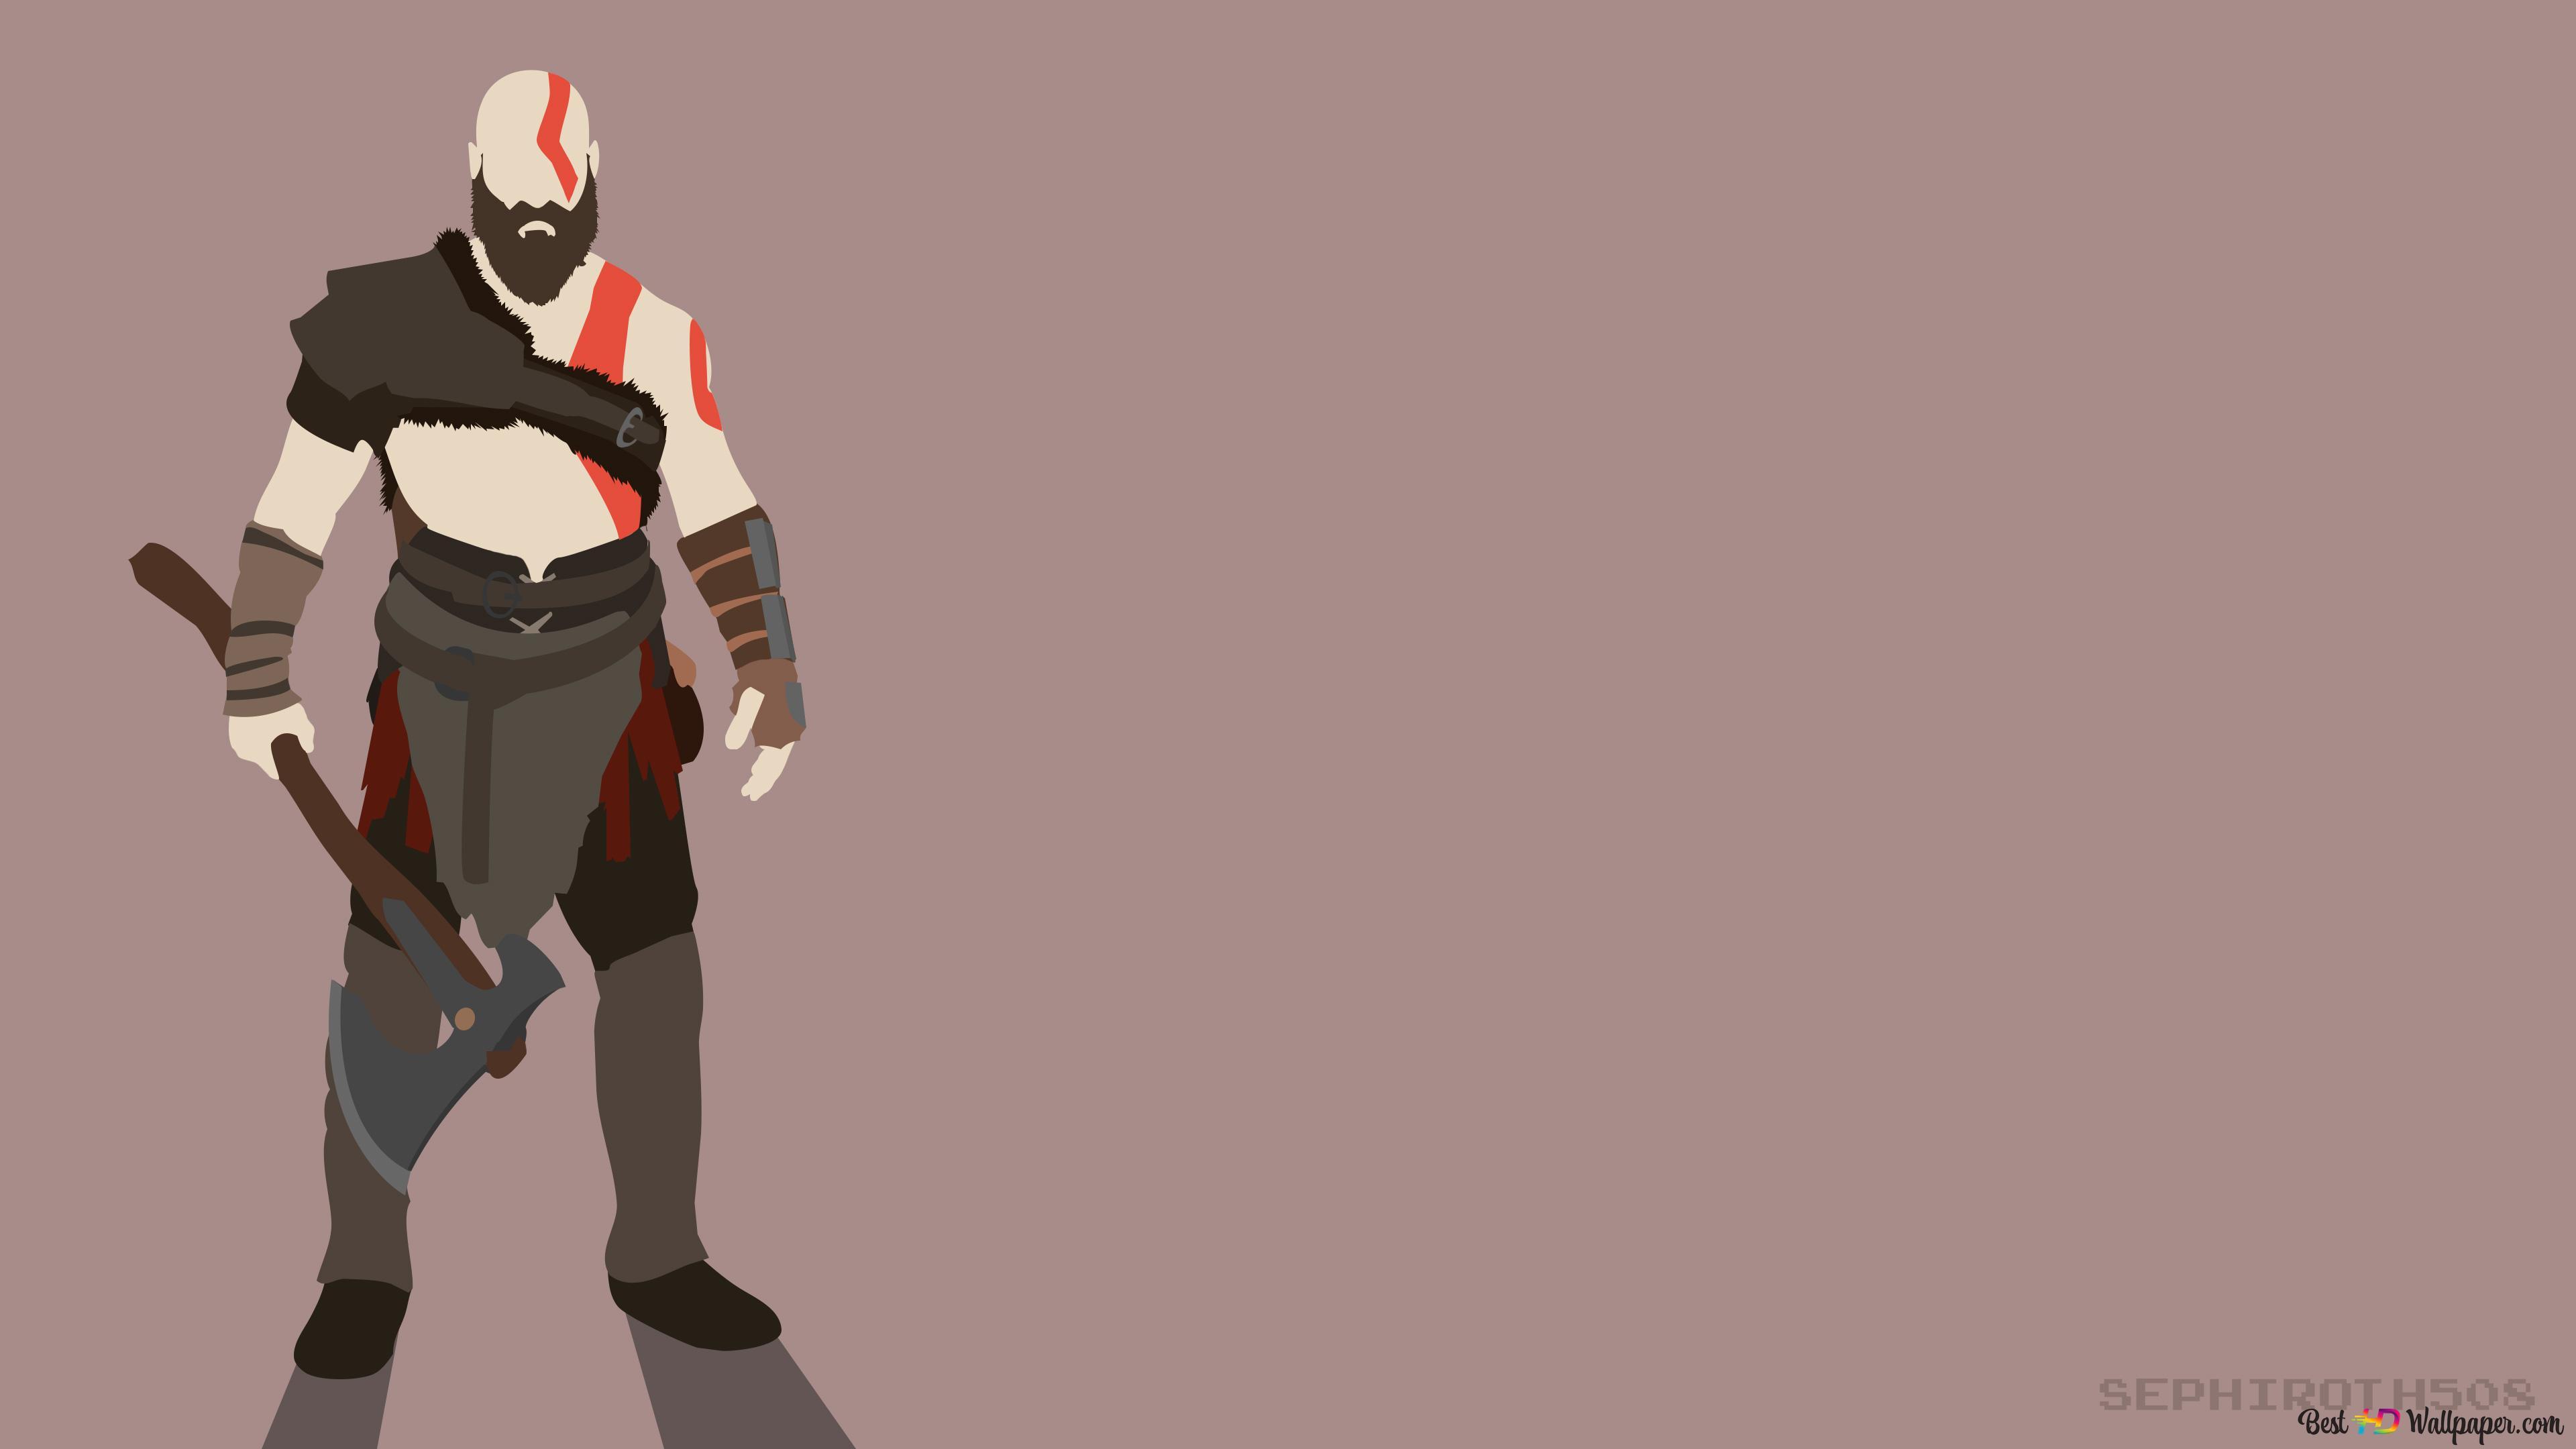 God Of War Video Game Kratos Minimalist Hd Wallpaper Download